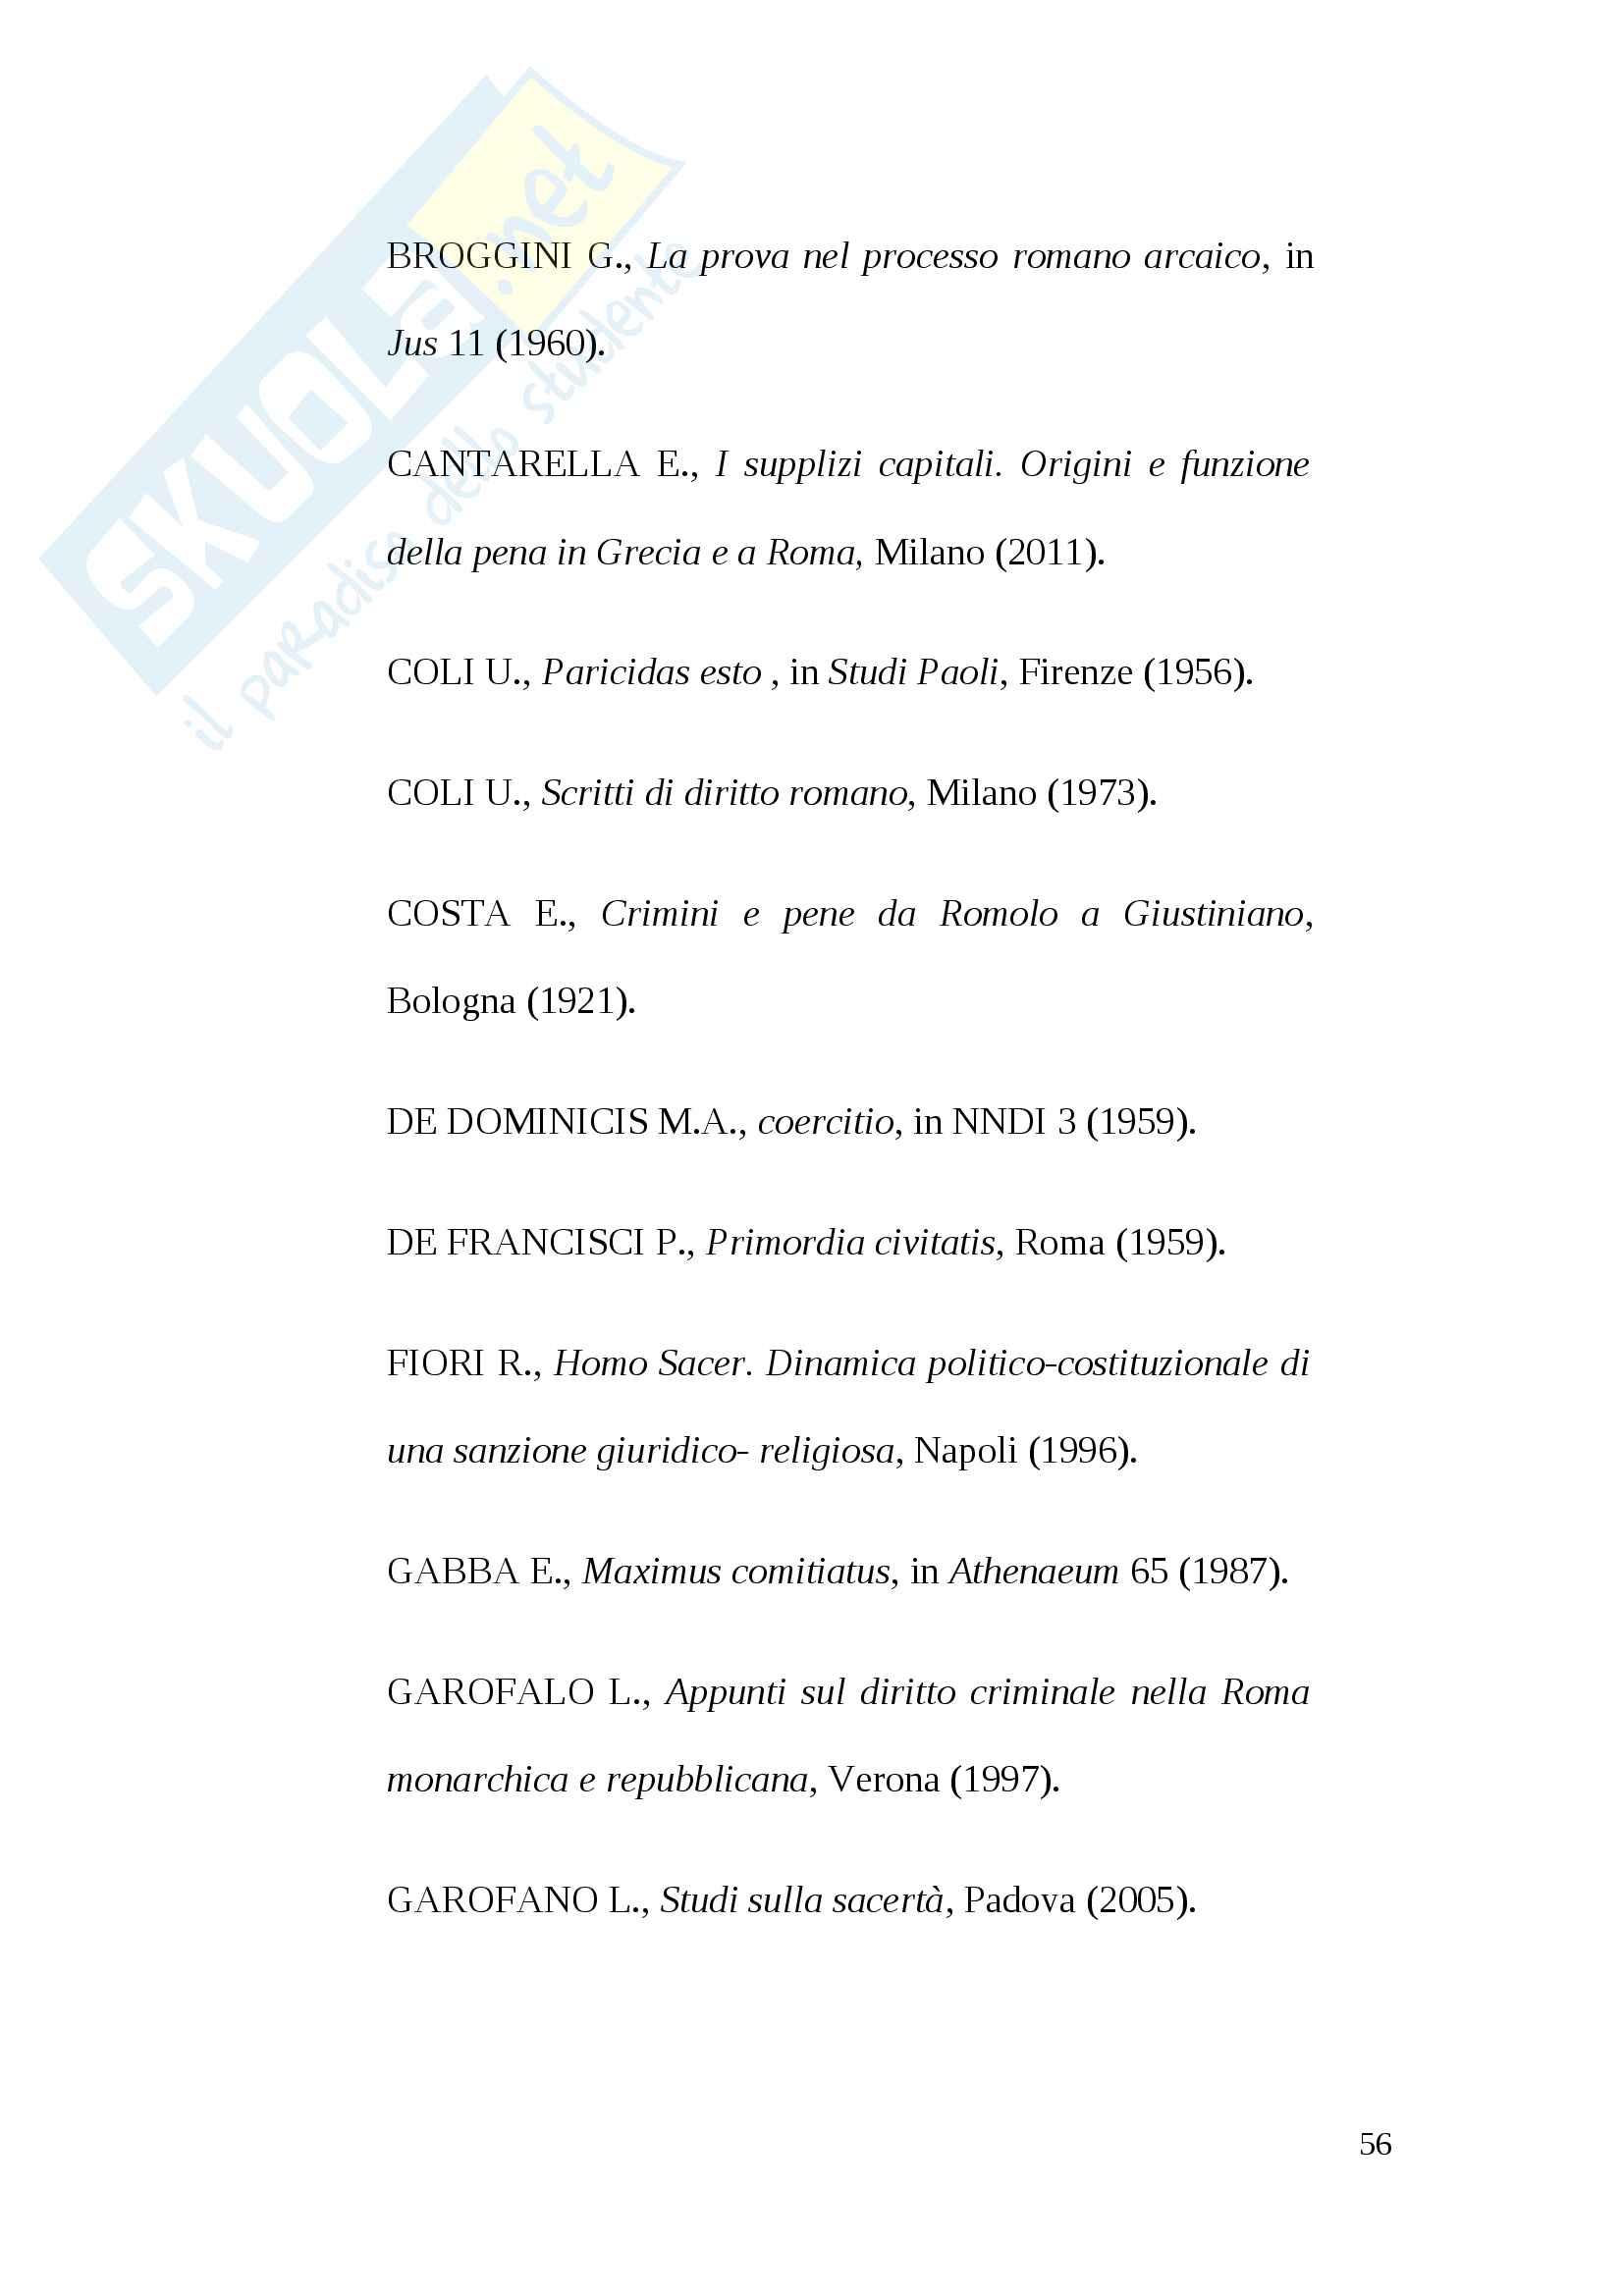 Tesi pena di morte antica Roma Pag. 56